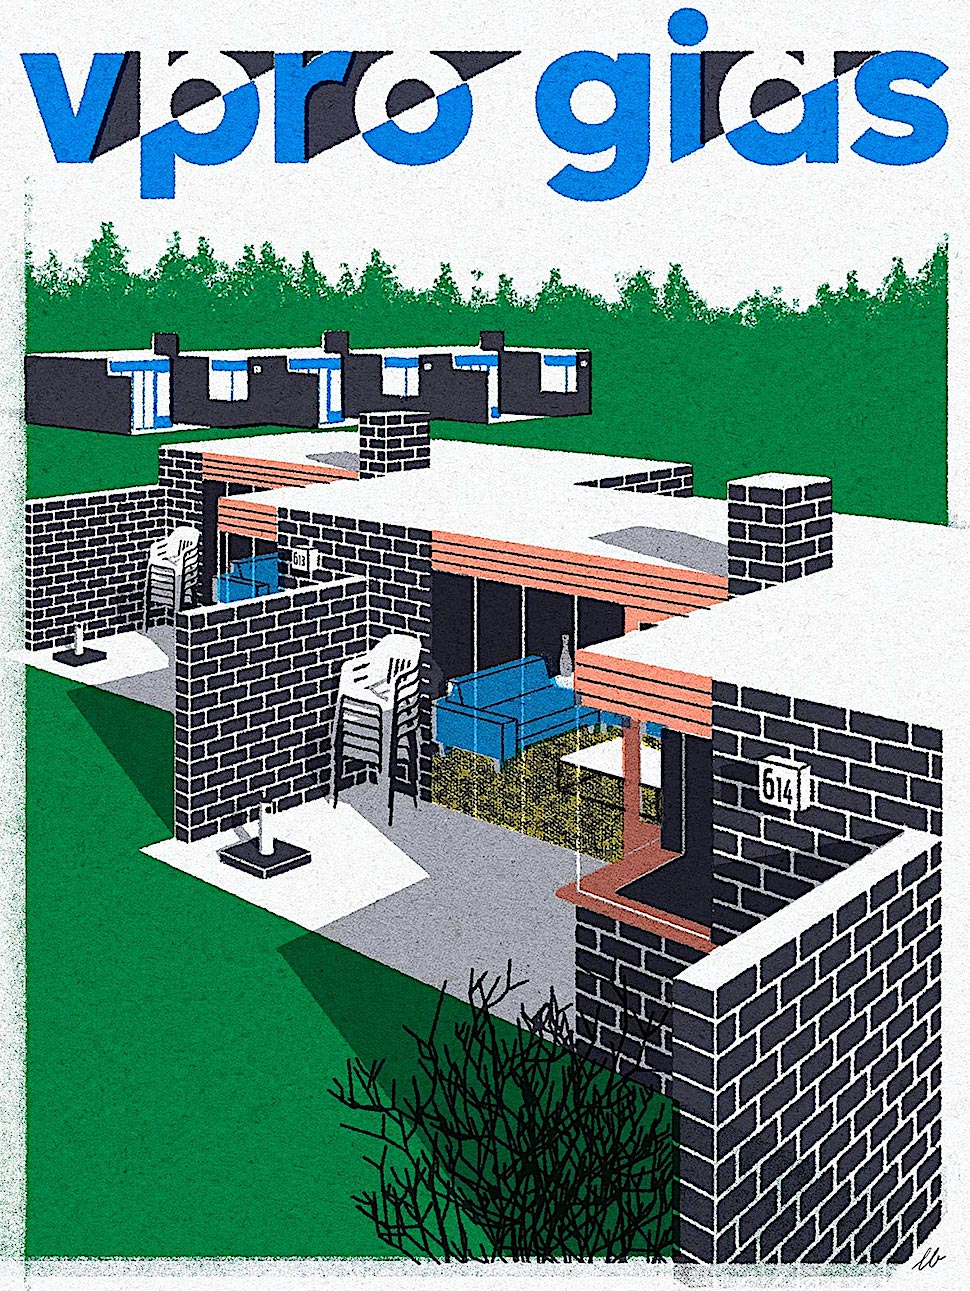 a Leonie Bos art print of exterior homes